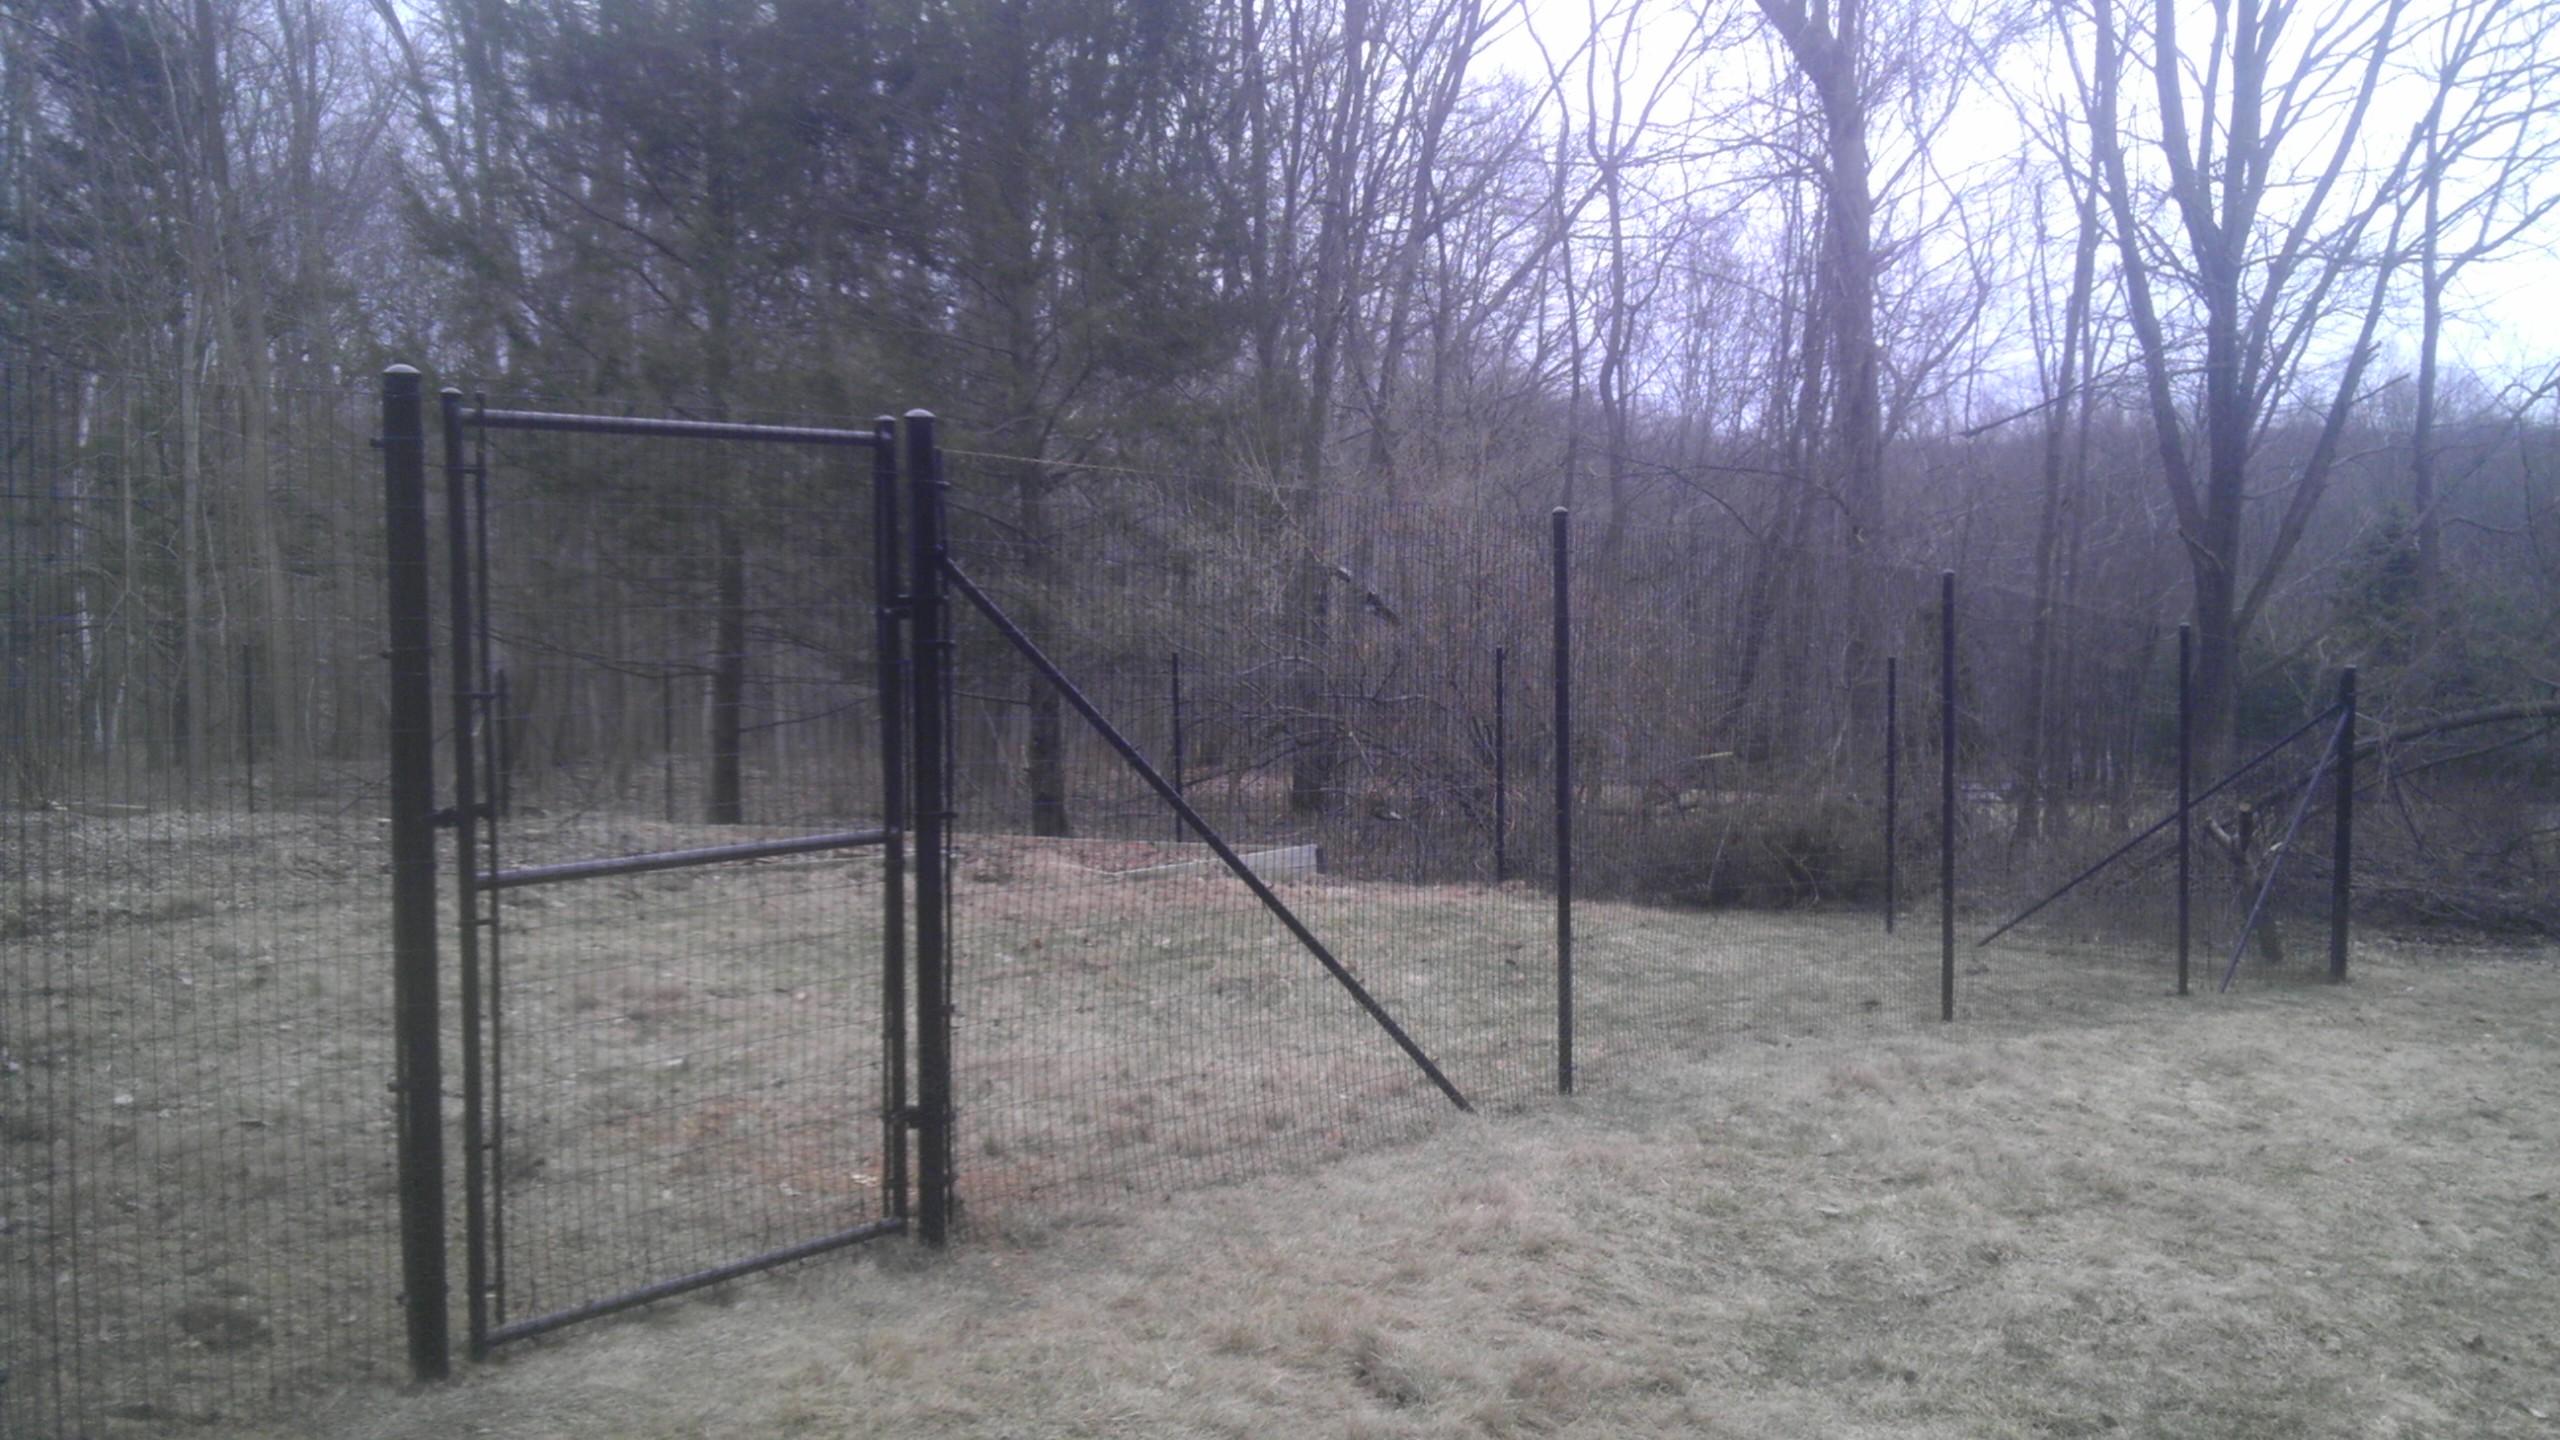 2x4 Deer Fence